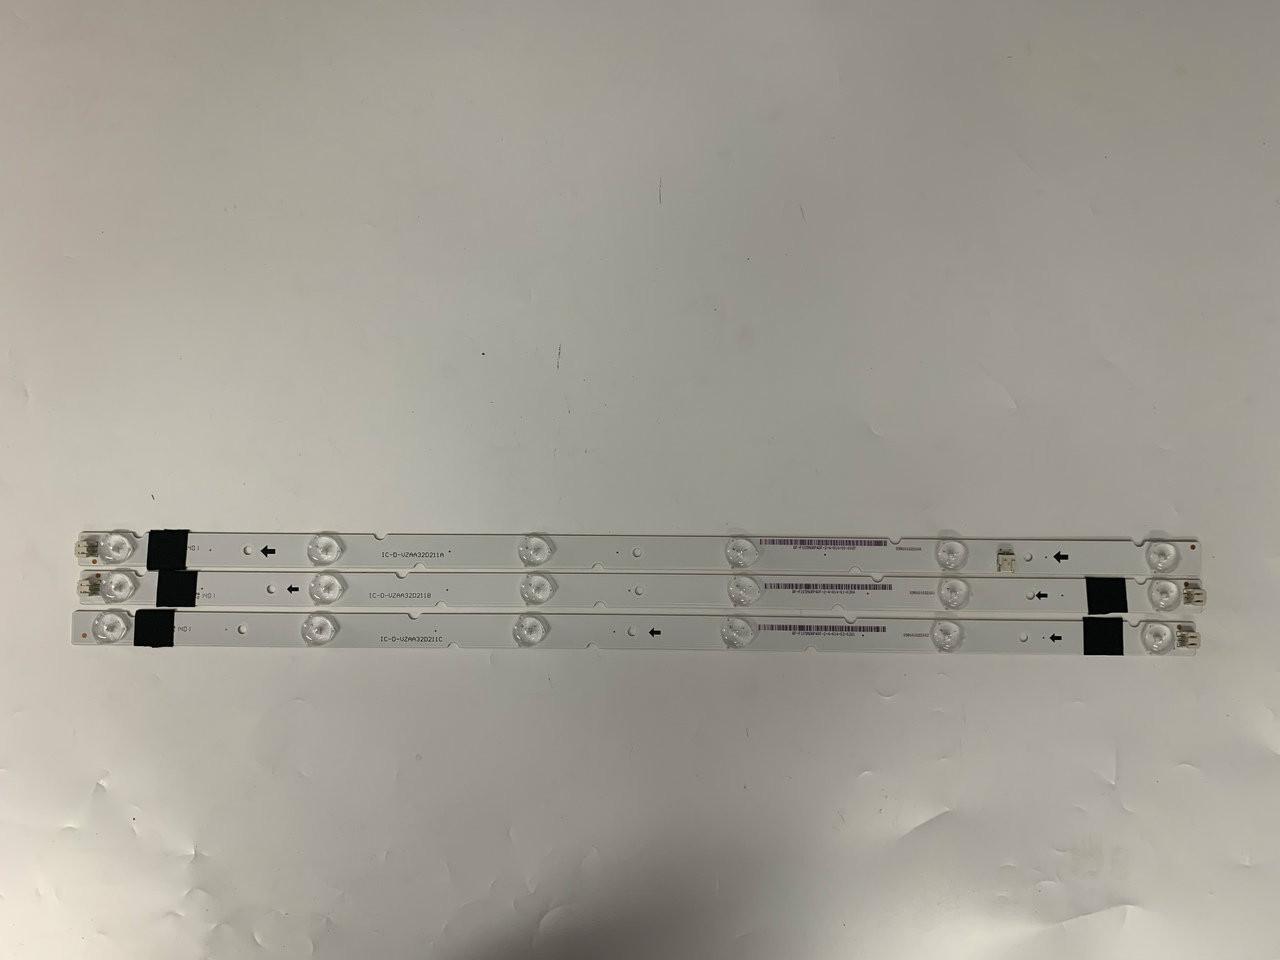 VIZIO E320-B0 IC-D-VZAA32D211A B AND C BACK LED LIGHTS 3 PCS SET